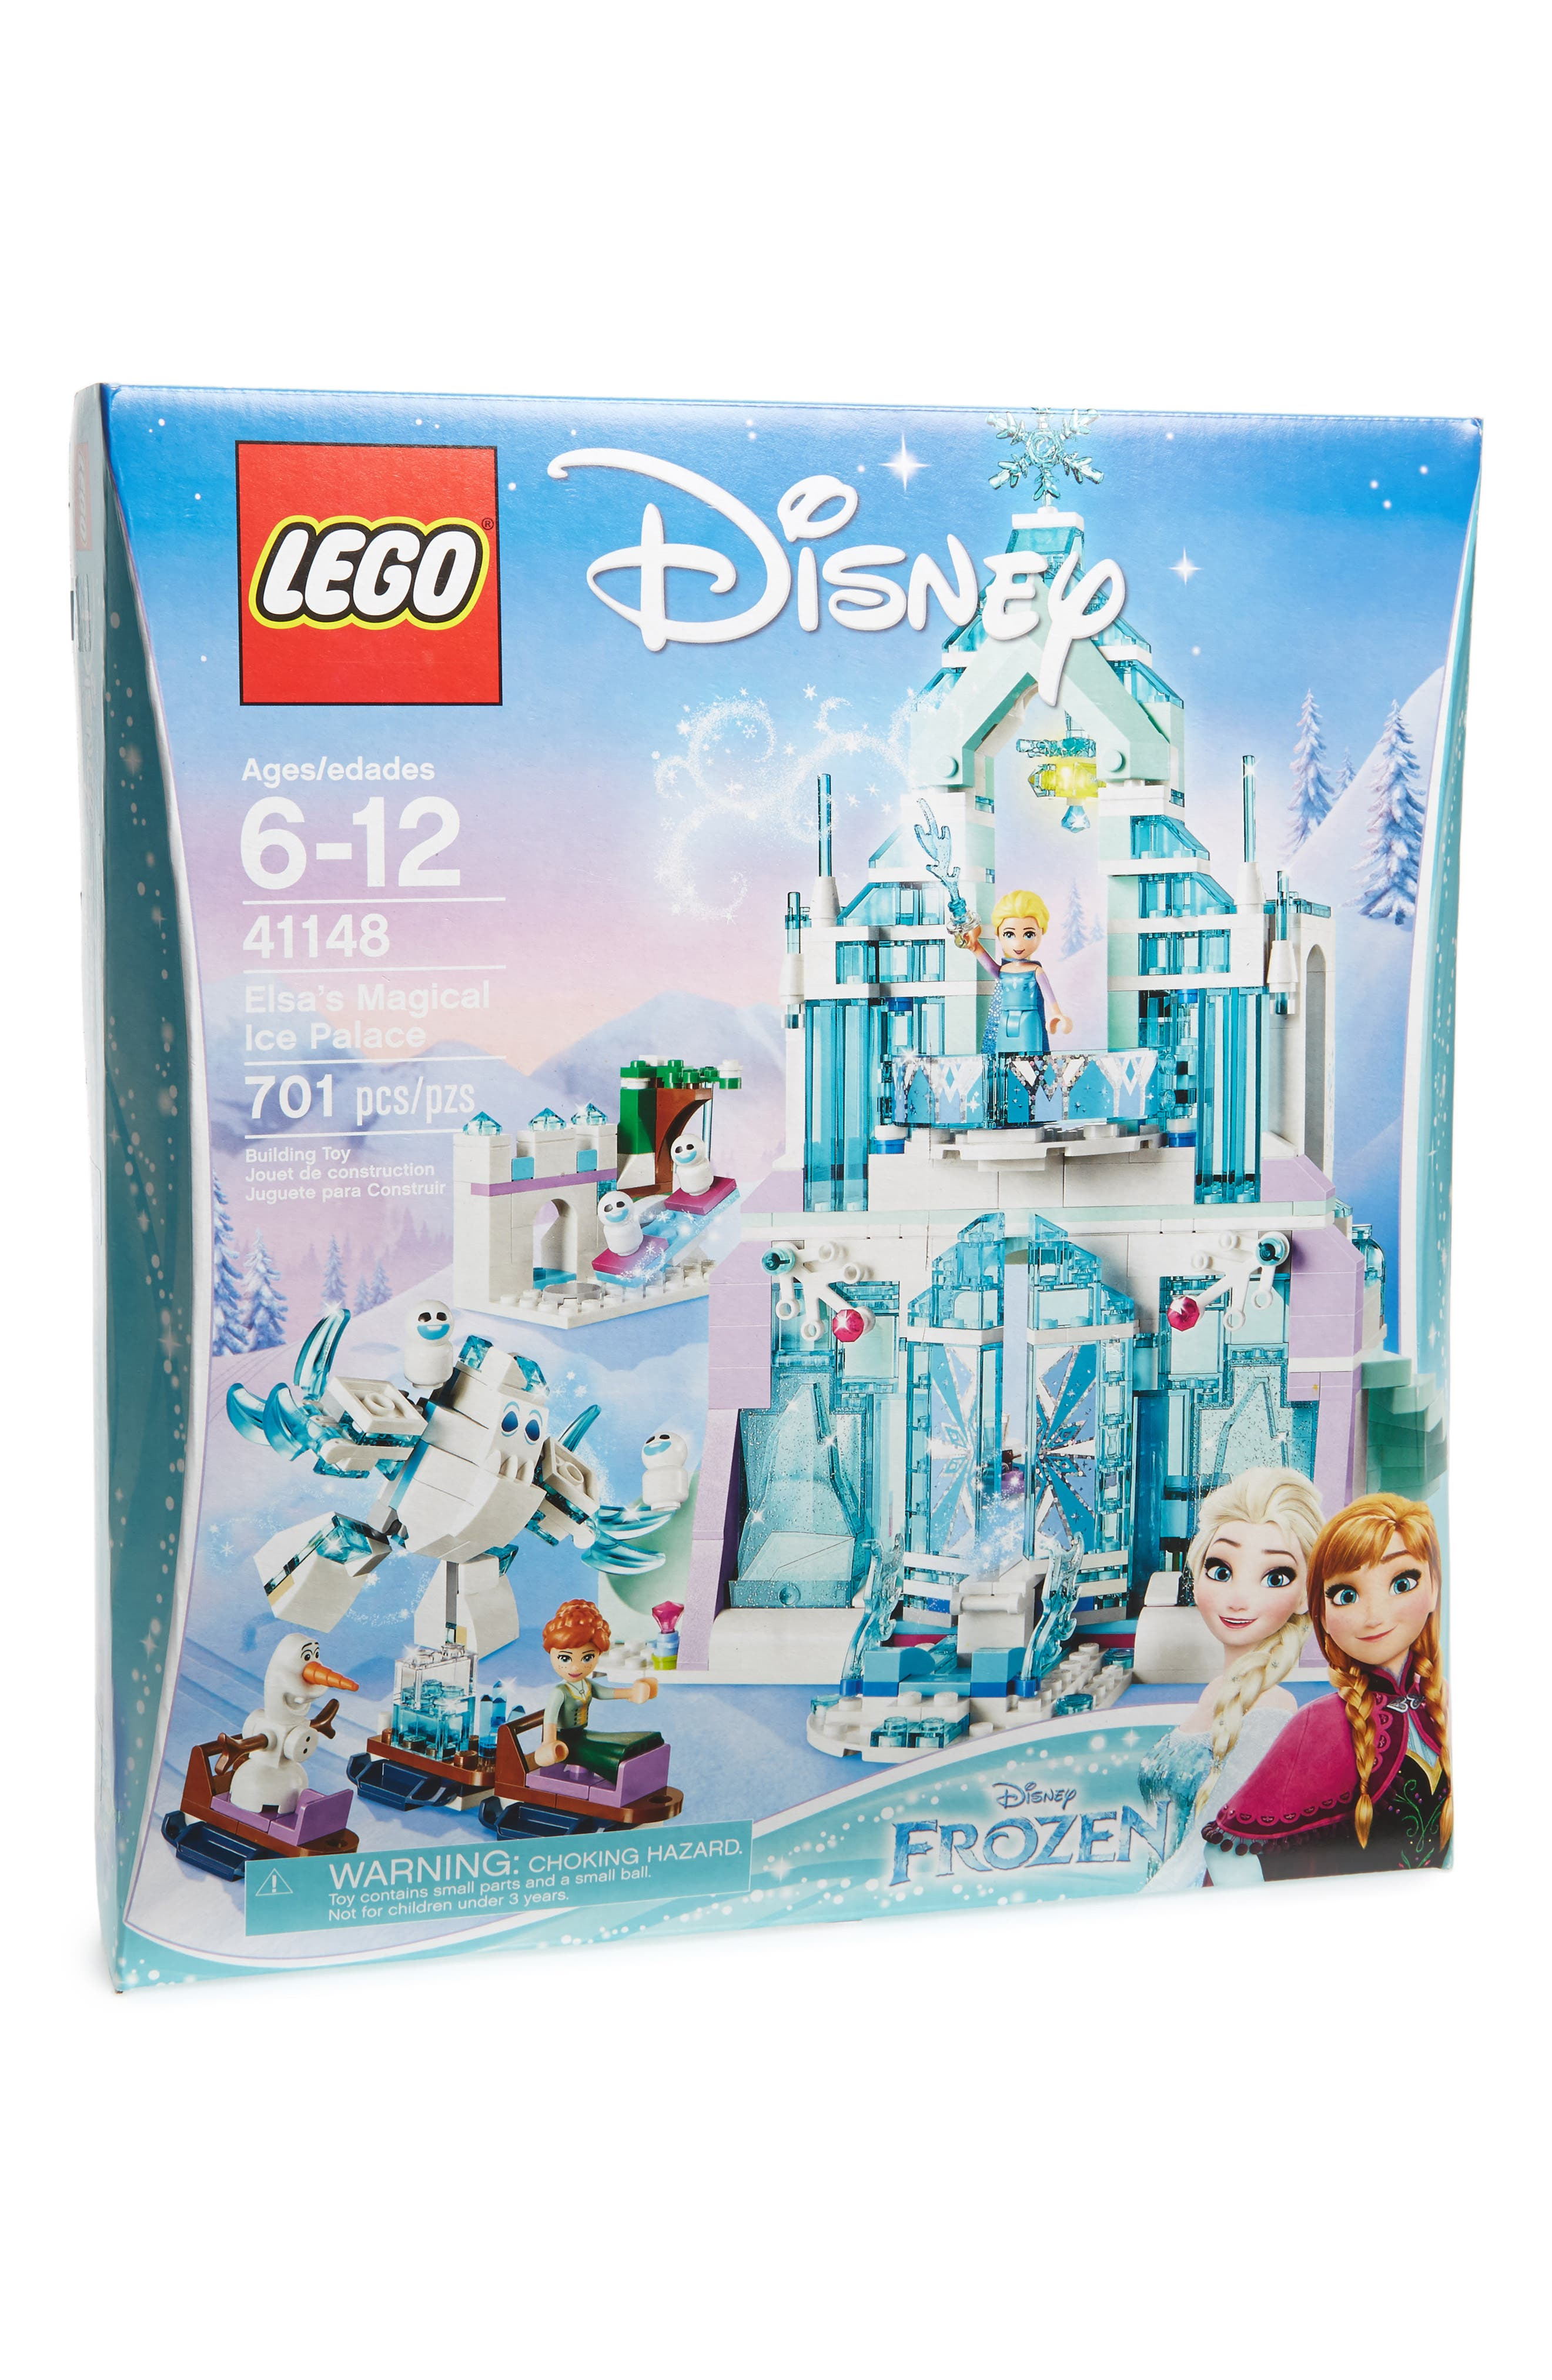 LEGO® Disney™ Elsa's Magical Ice Palace – 41148